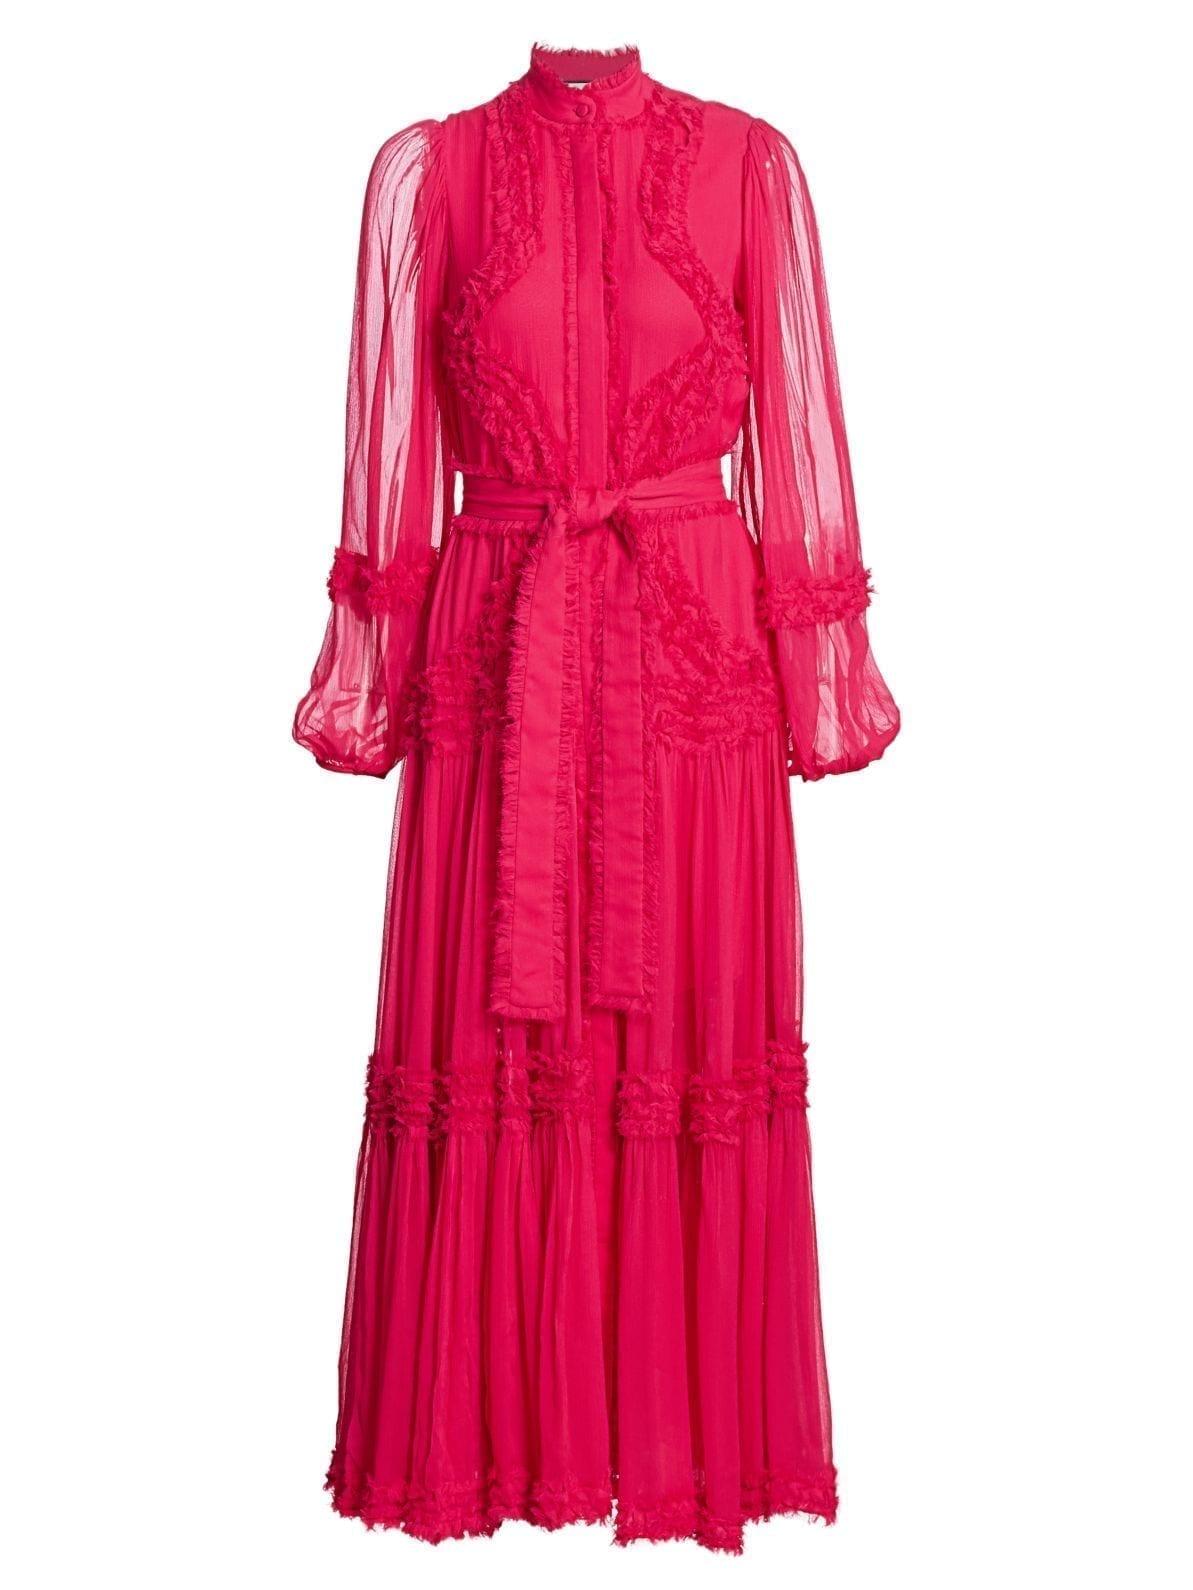 ALEXIS Patrizia Sheer-Sleeve Silk Dress